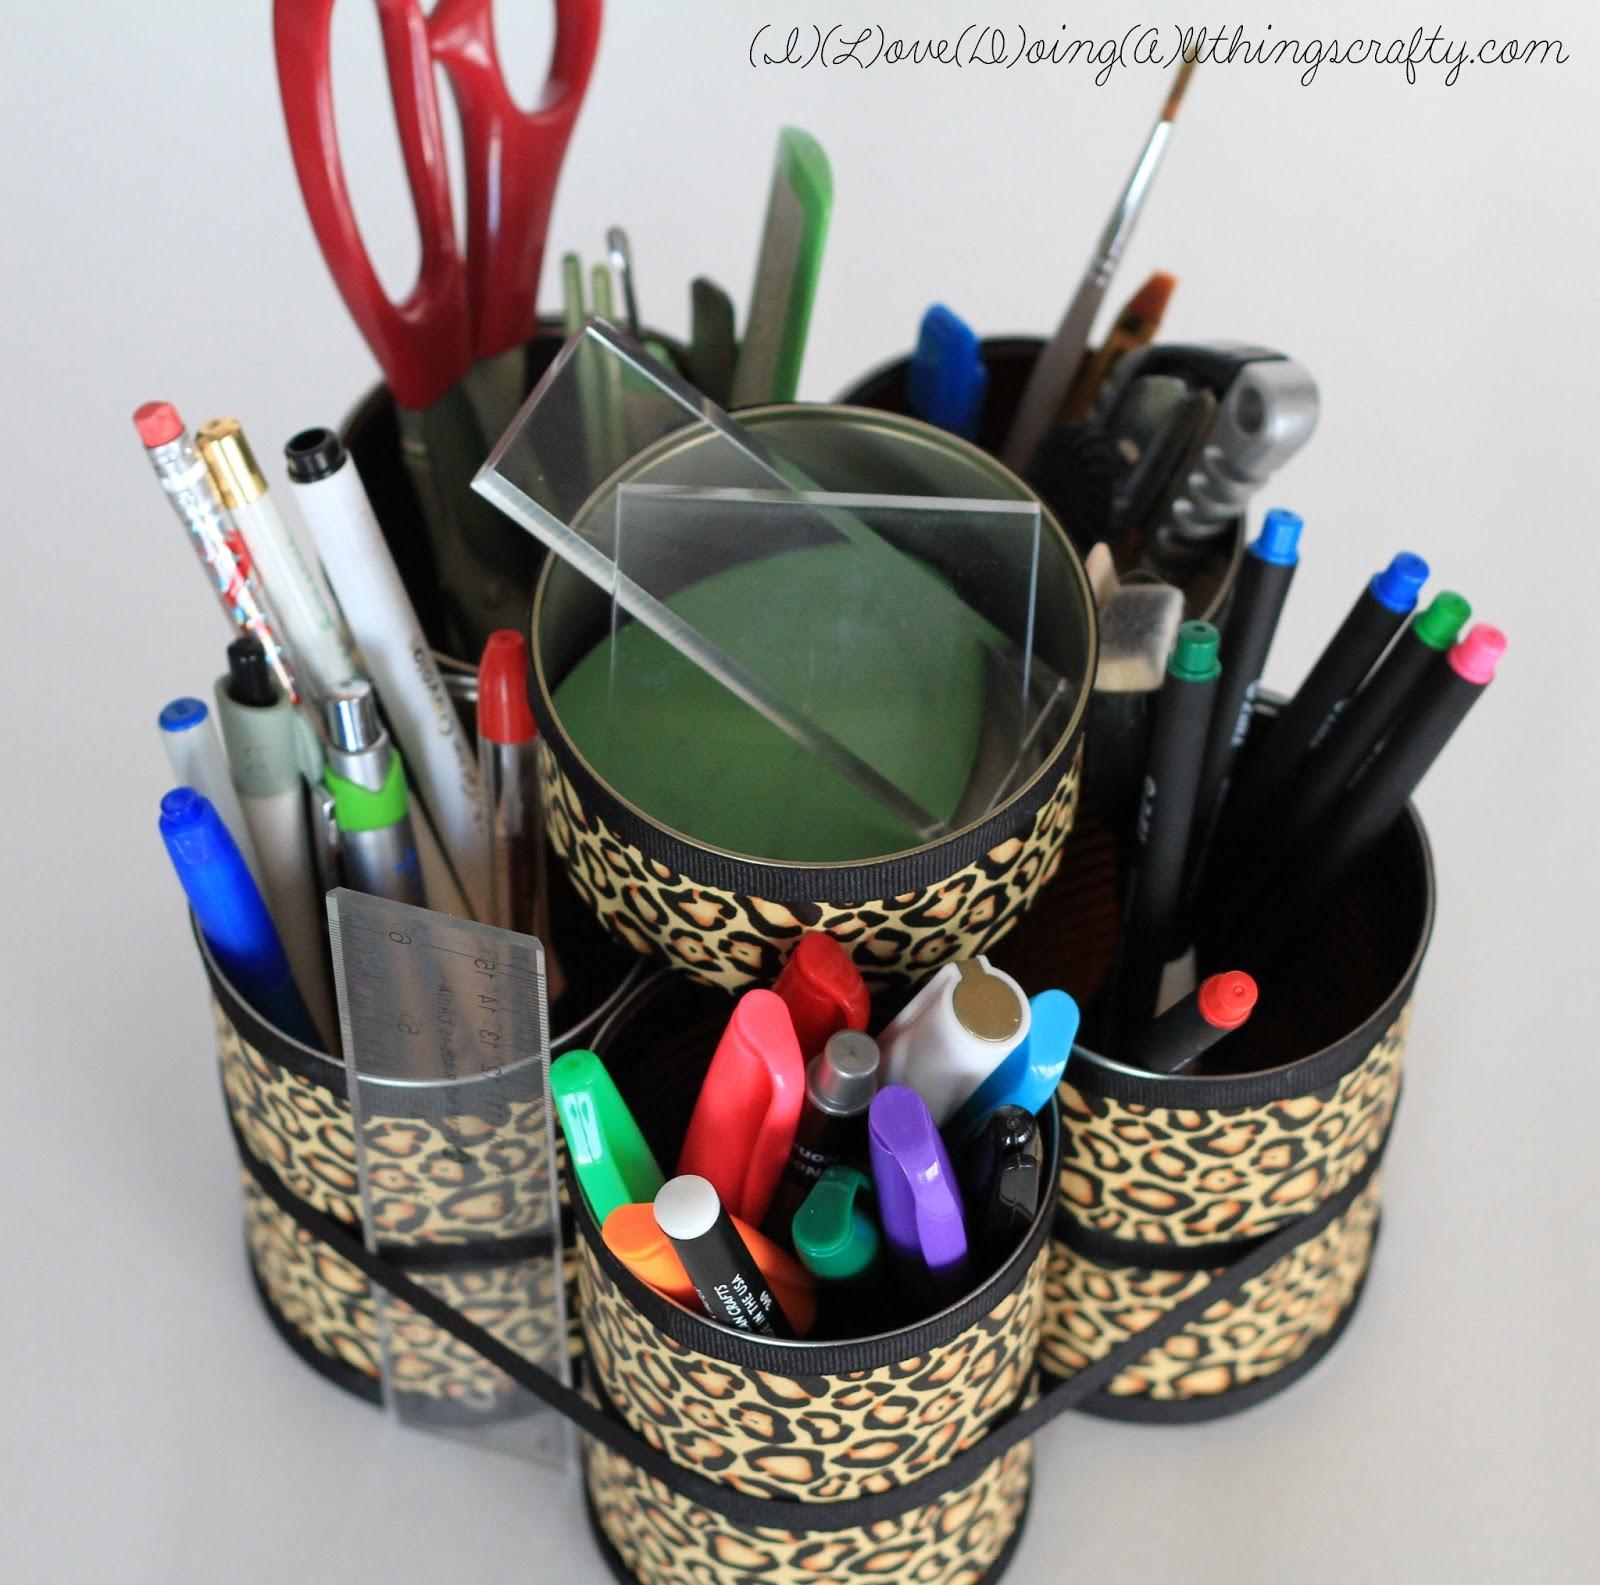 I Love Doing All Things Crafty: DIY Desk Organizer